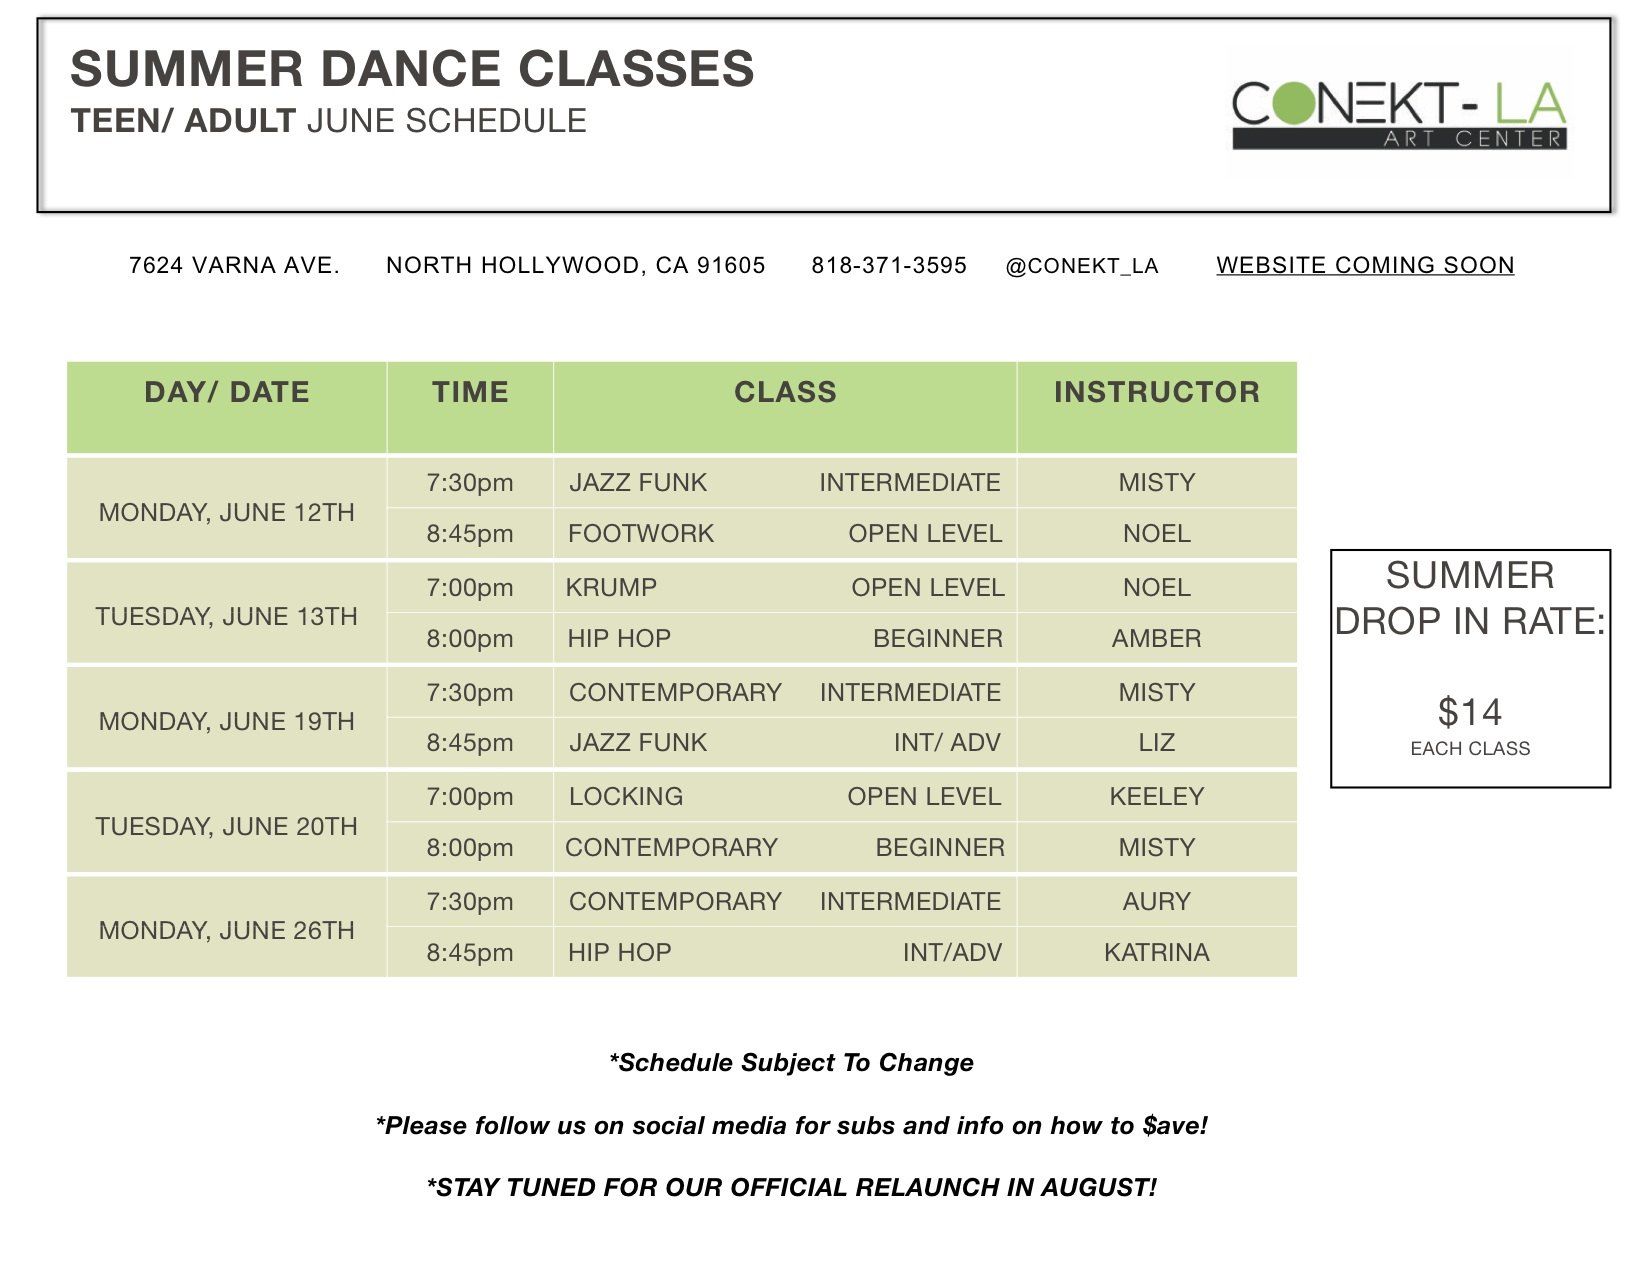 Summer teen: adult classes